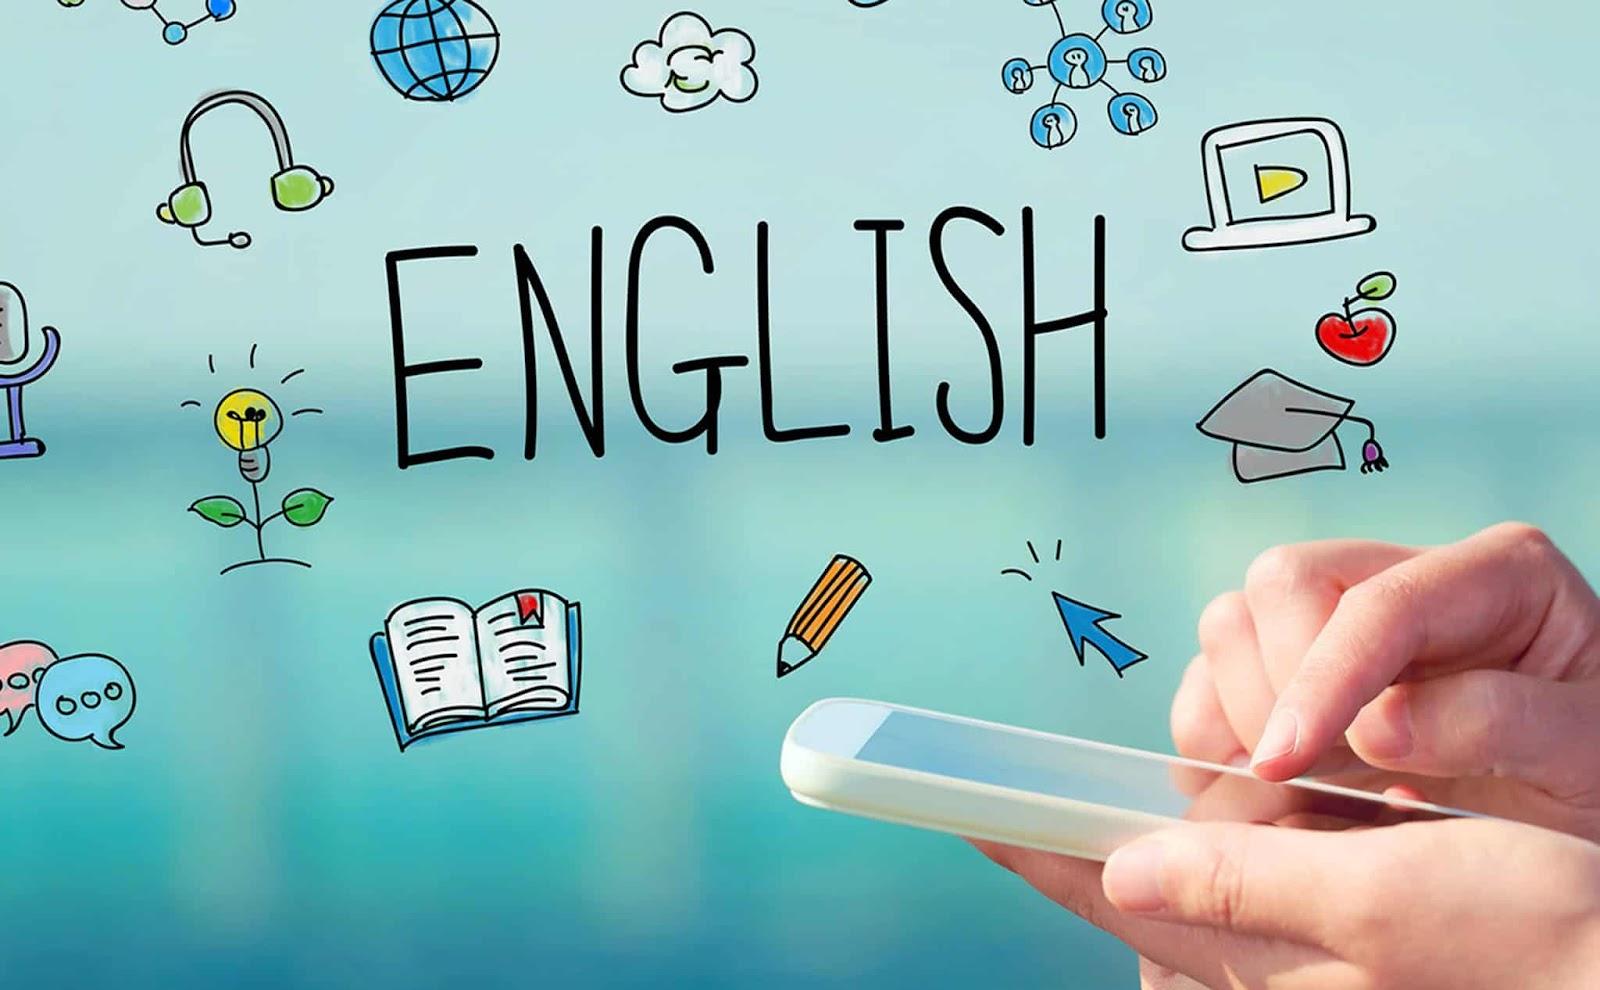 luyện nói tiếng Anh cho học sinh tiểu học, bí quyết luyện nói tiếng Anh cho học sinh tiểu học 4IK7iuQD39_bunJcVScUp3ooejkTPyhS-sgllTifGZ9fkZFLV_U6KxtxNlYCHk5q2VJe6_3Dp-csGwZGsSnxKV25u30yAkBk5msbn9Wyxy5WSIu48d6FonYHYpIZNZenNiNWQT9q